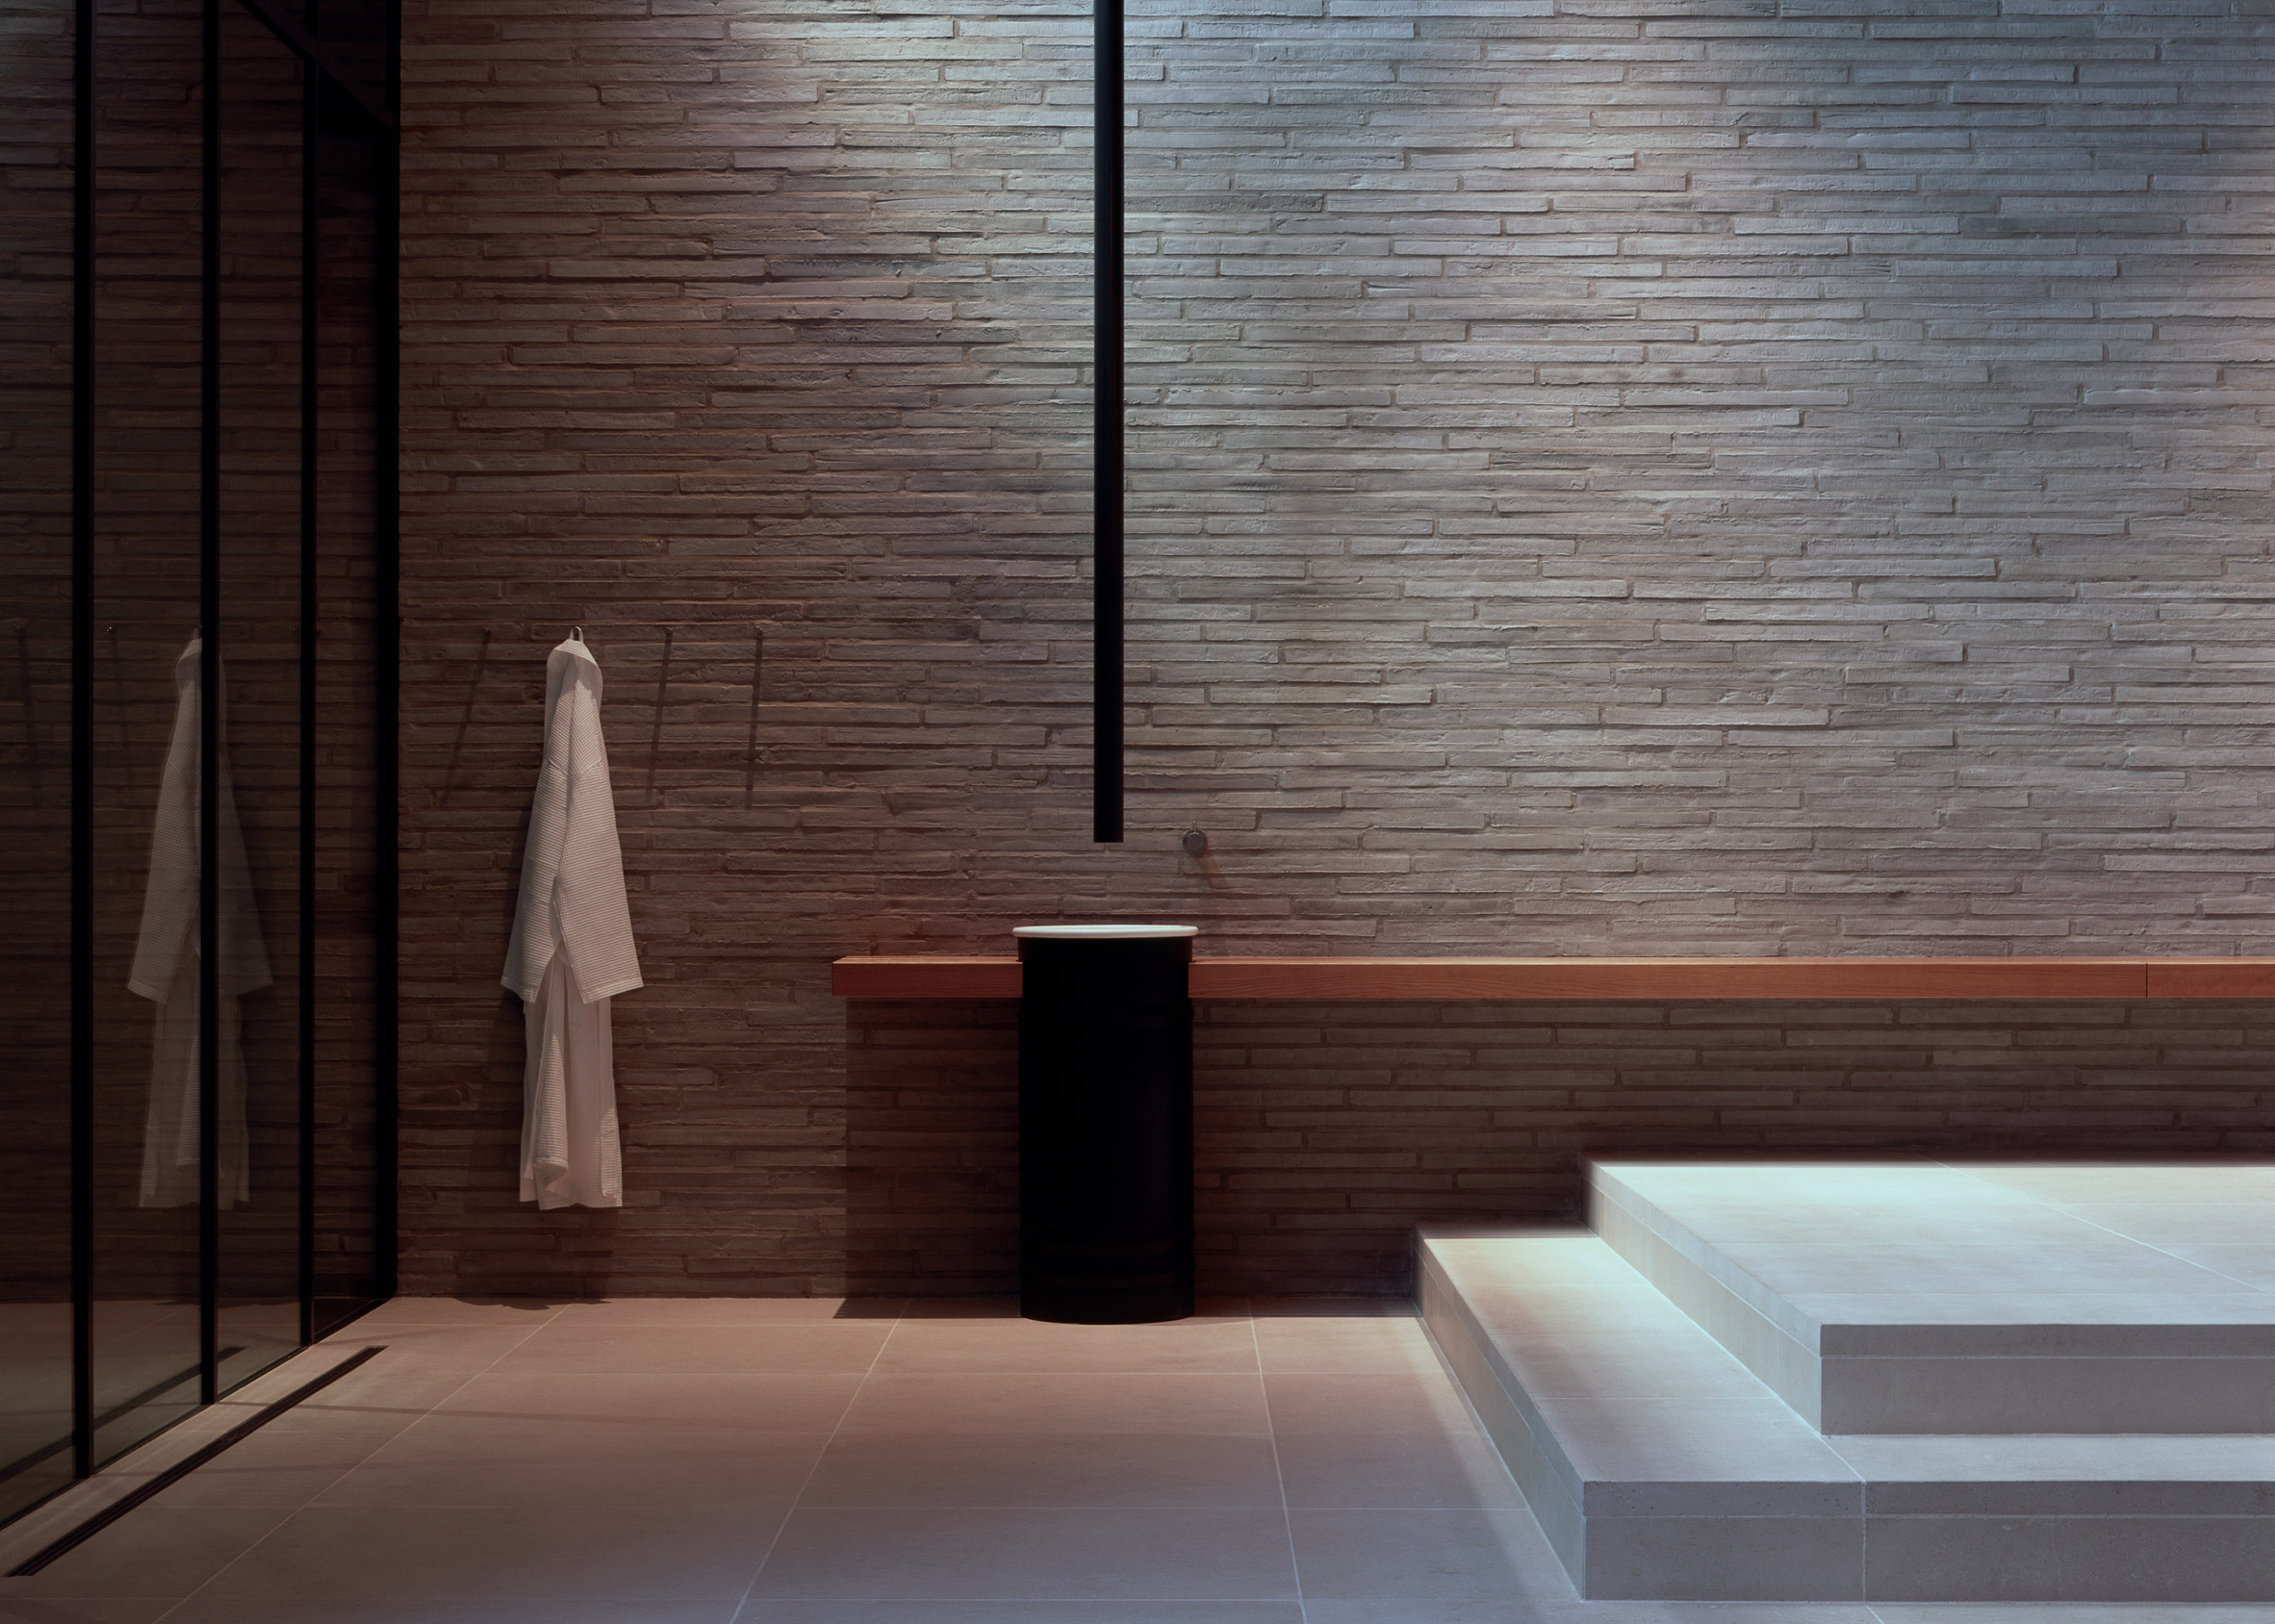 Dezeen Awards interiors winners: London Spa by Richard Bell Architecture